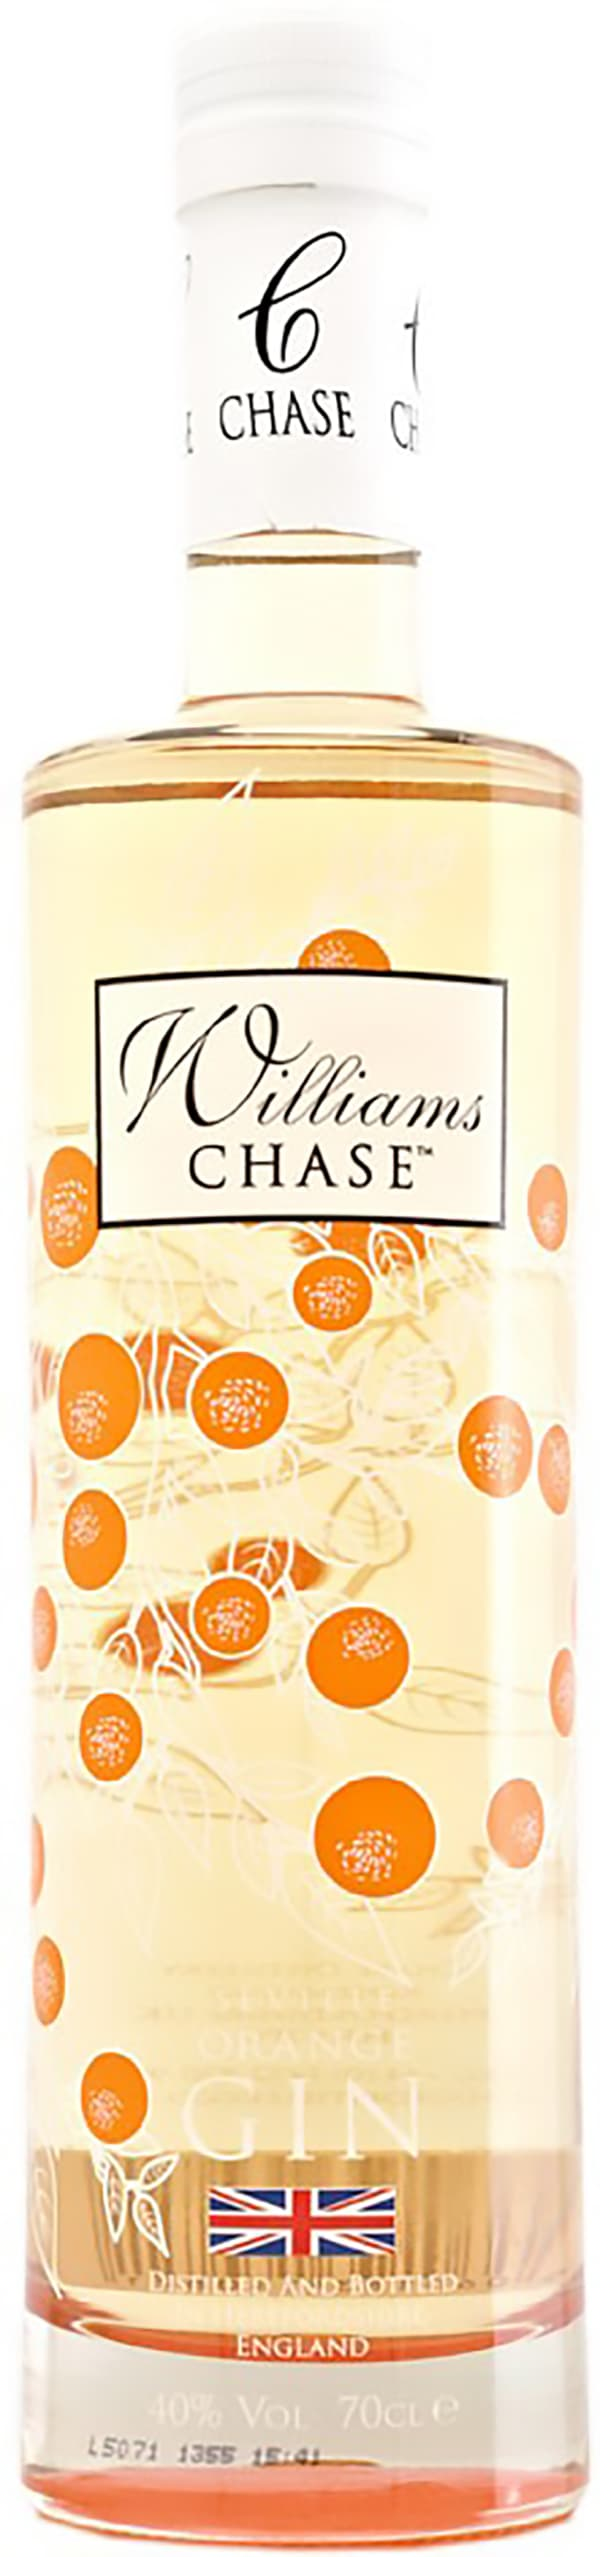 Williams Chase Seville Orange Gin